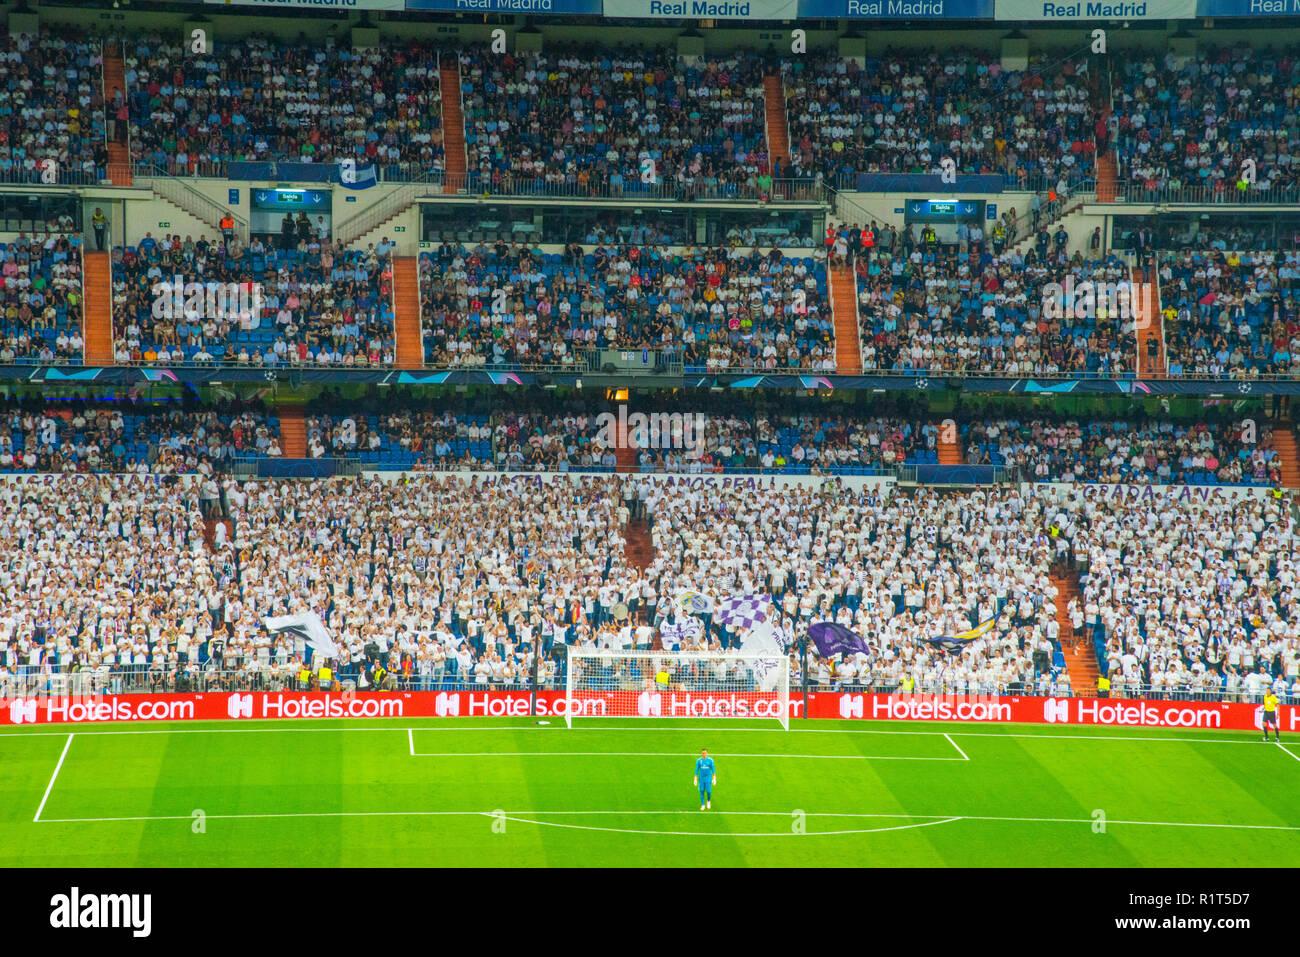 Football match, goalkeeper and fans. Santiago Bernabeu stadium, Madrid, Spain. - Stock Image